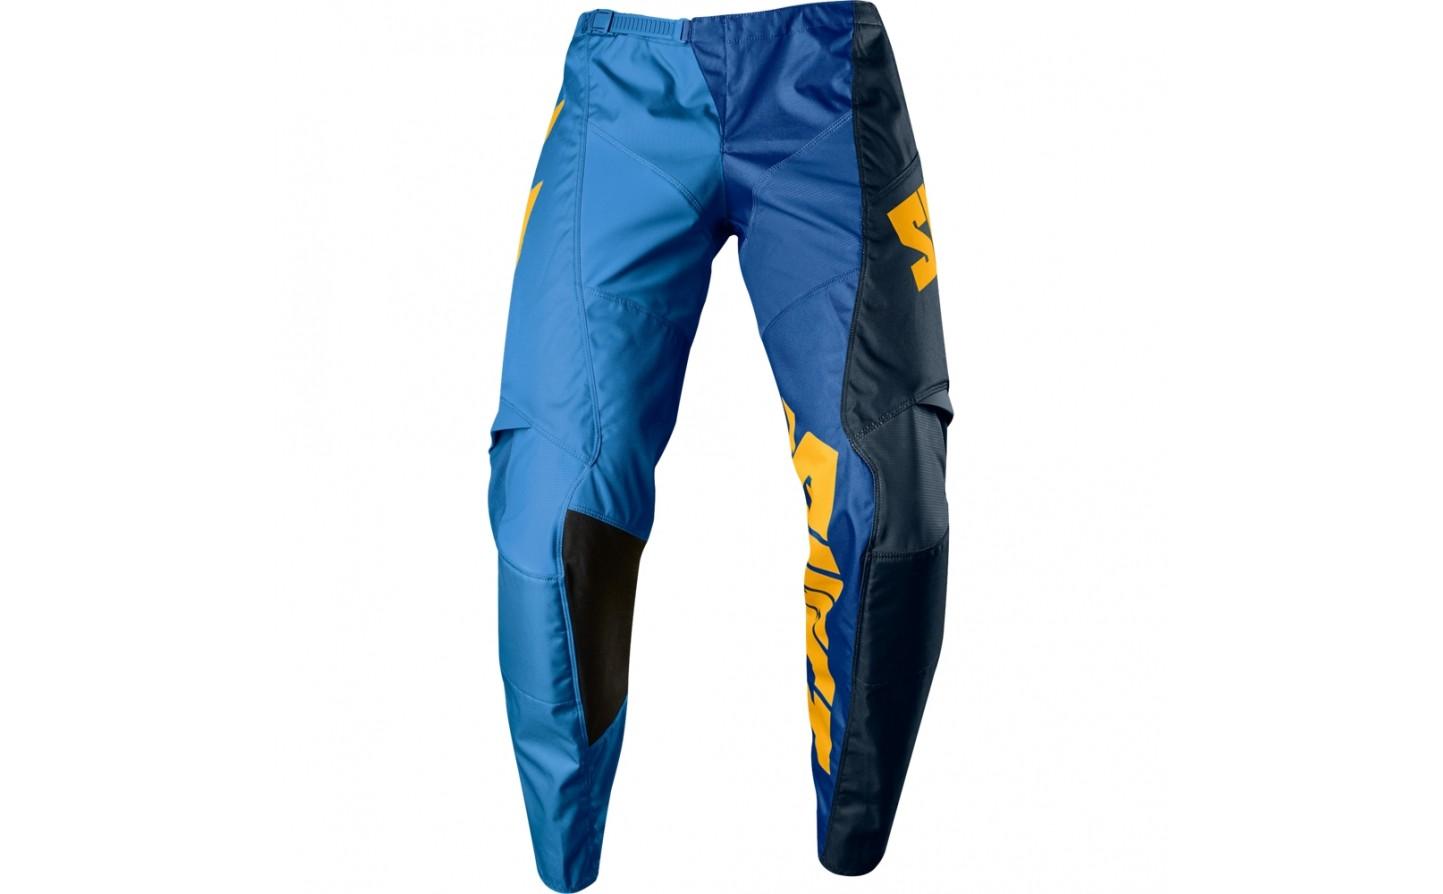 pantalon shift label whit3 tarmac azul talle 34